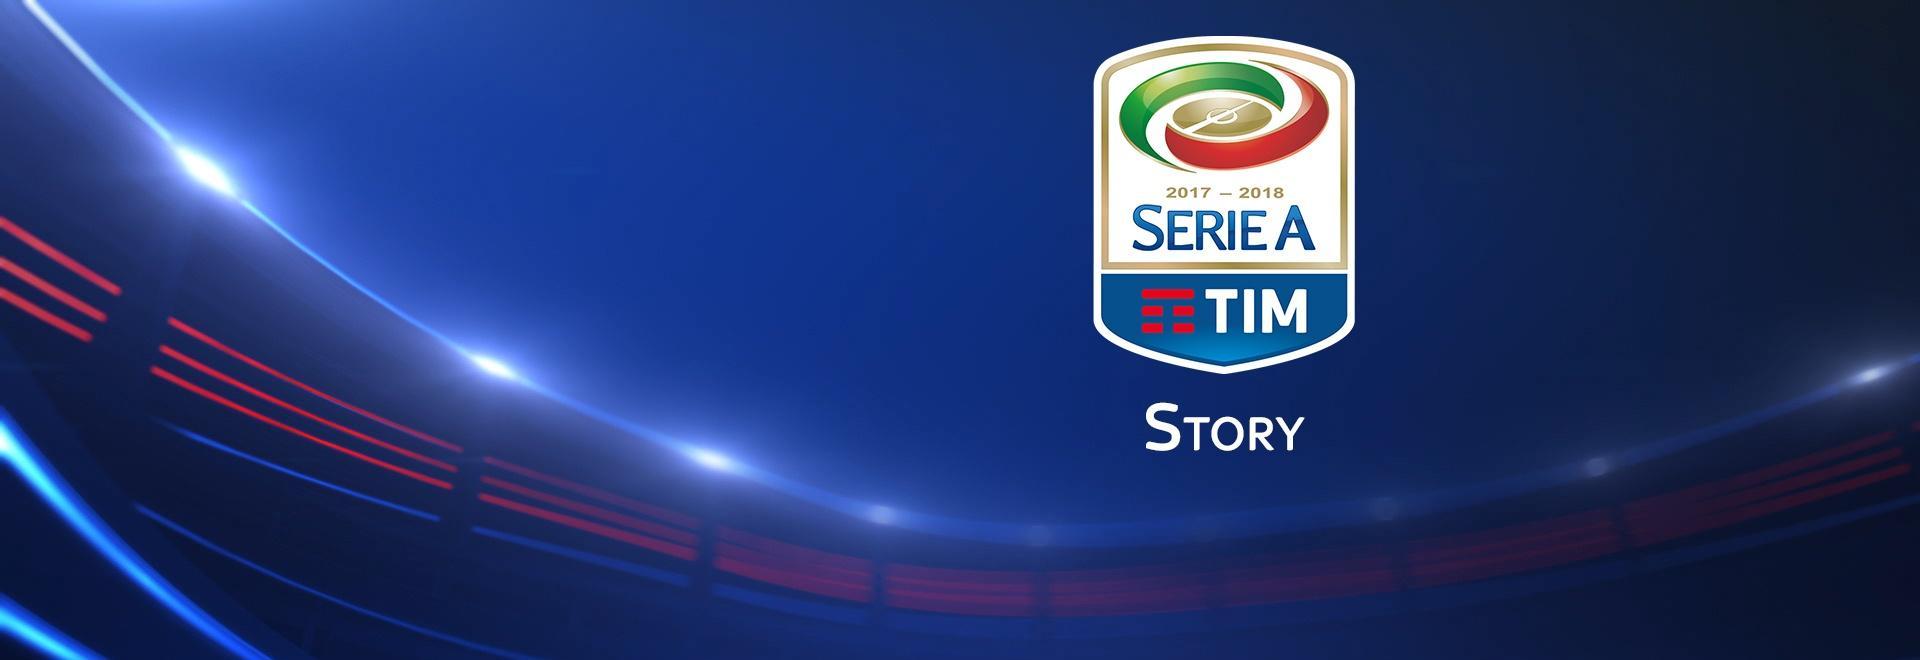 Inter - Roma 26/02/17. 26a g.